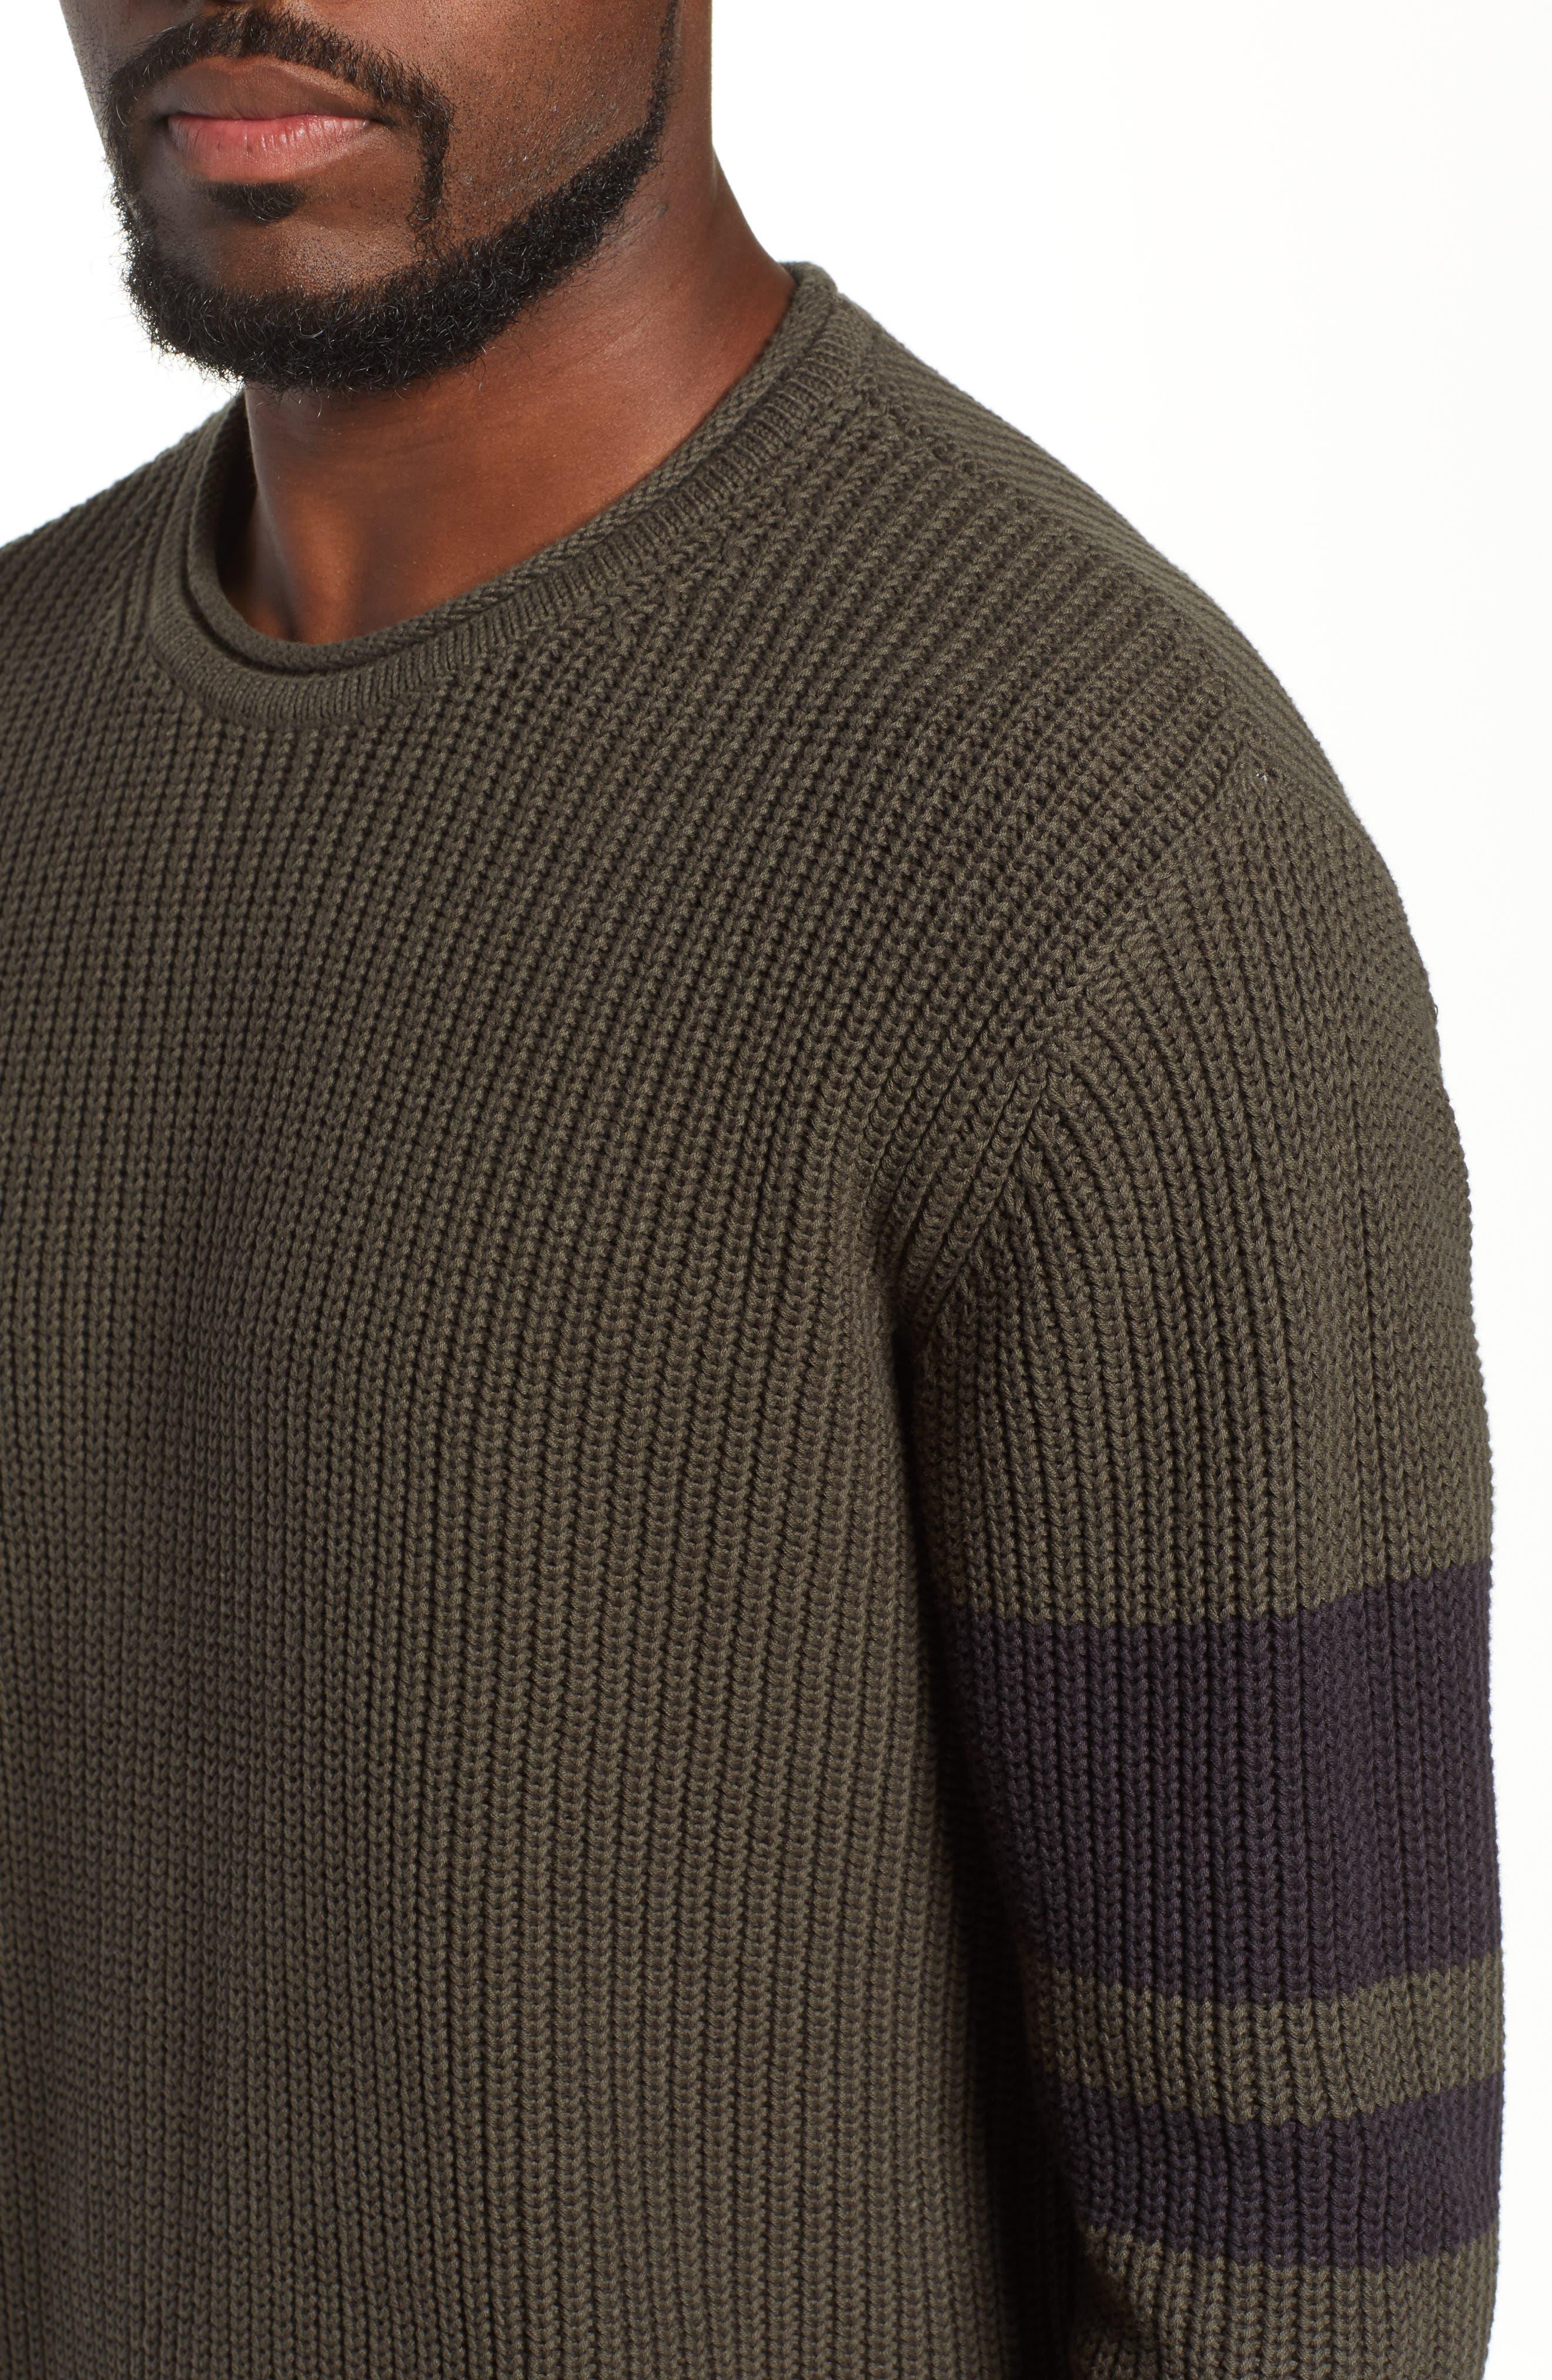 Jett Slim Fit Crewneck Sweater,                             Alternate thumbnail 4, color,                             OAK GROVE/ BLACK